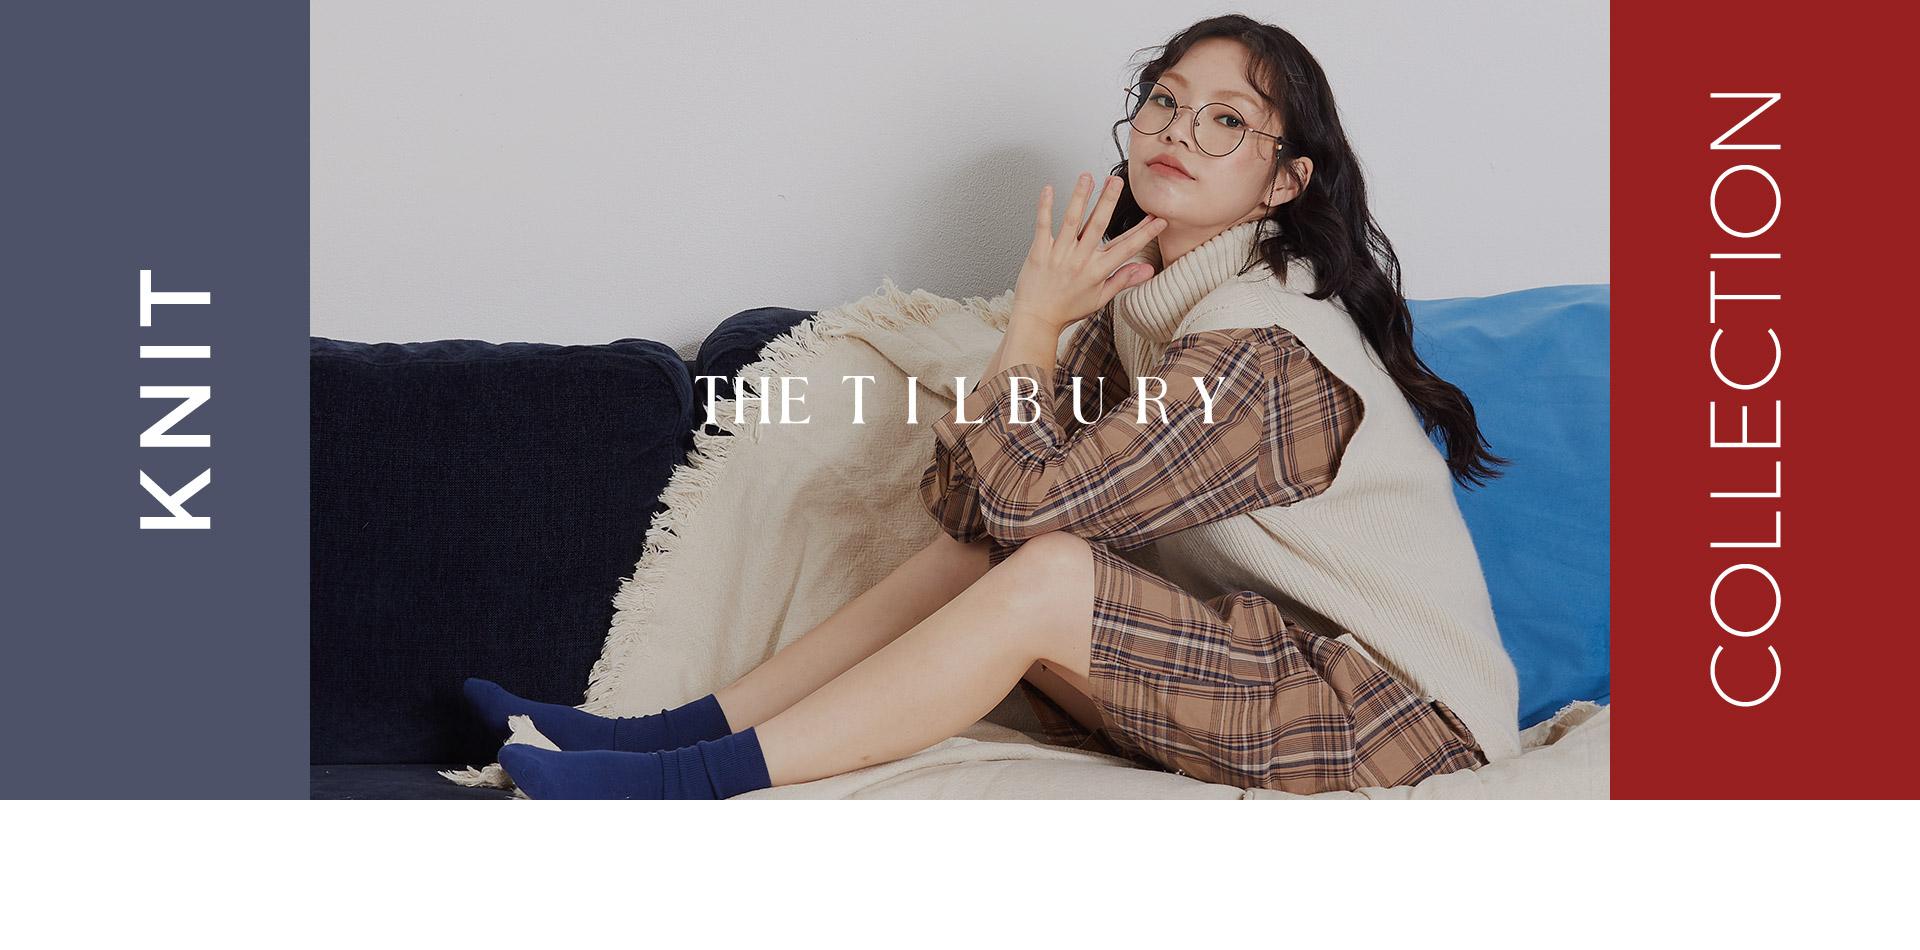 the tilbury,더틸버리,틸버리,바바패션,패션,니트,knit,collection,니트,콜렉션